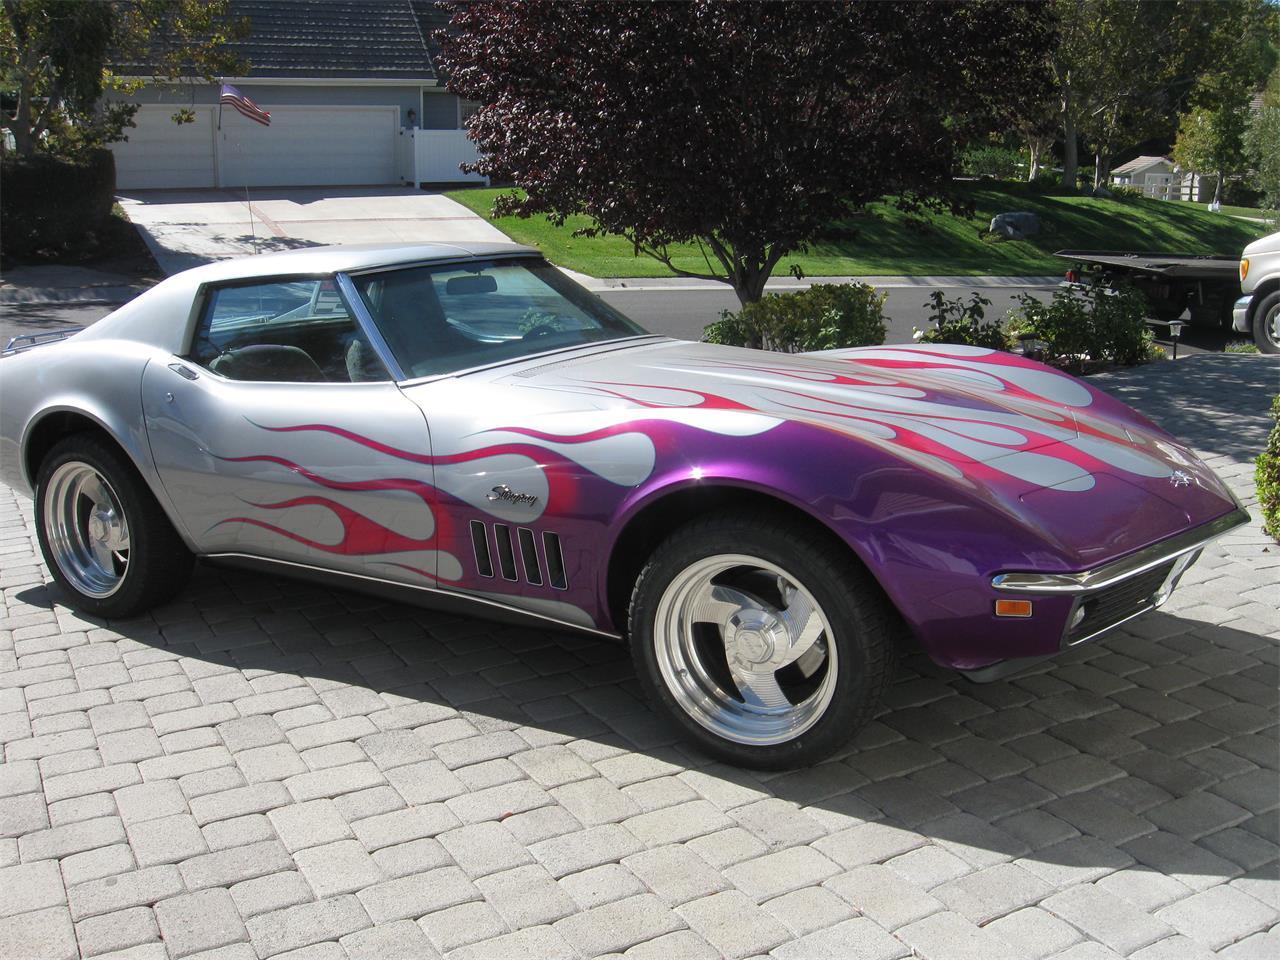 1969 Chevrolet Corvette Stingray For Sale Classiccarscom